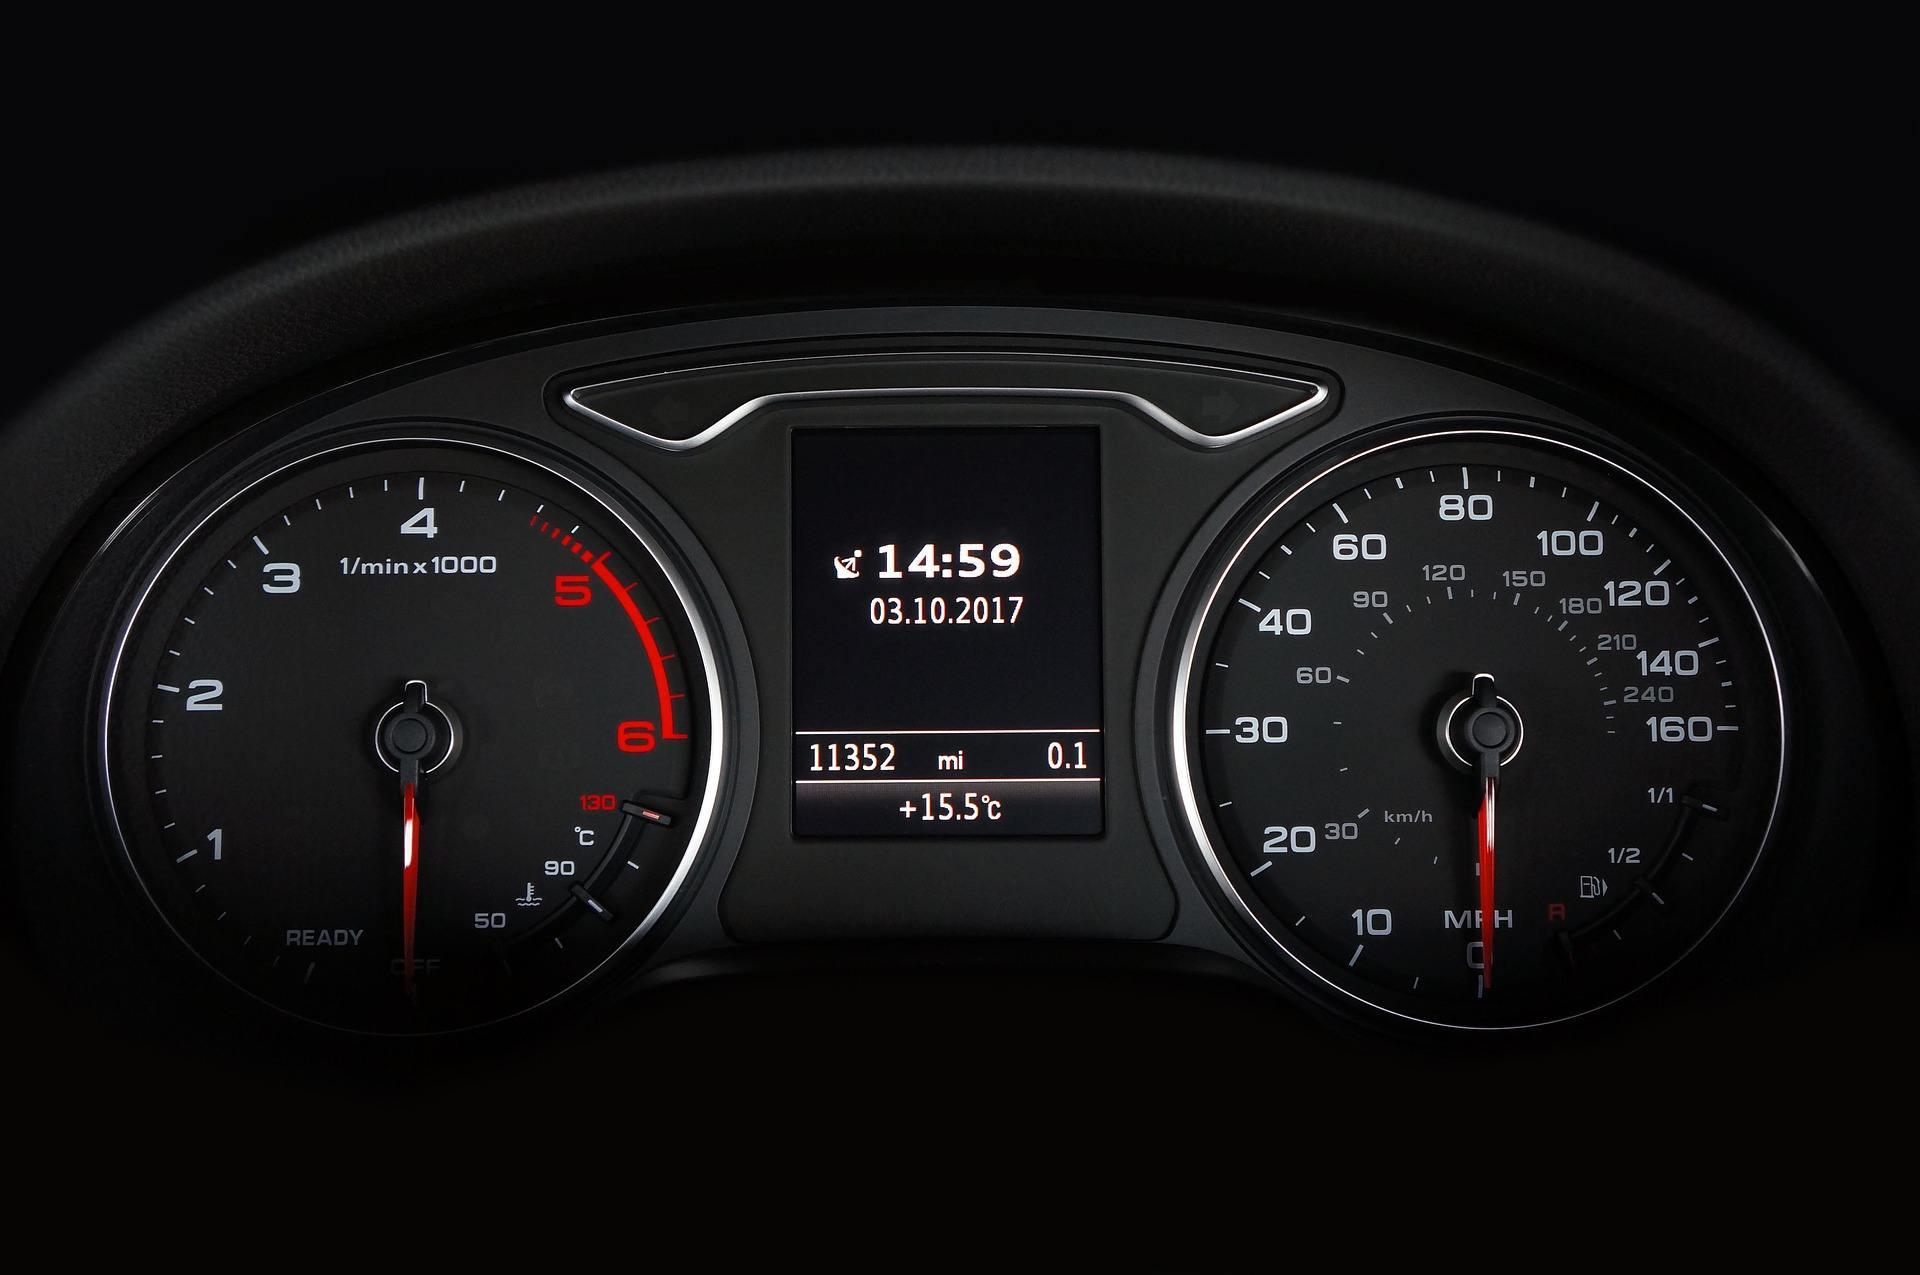 SA:2019年汽車半導體廠商總收益同比下降1.3% 至372億美元